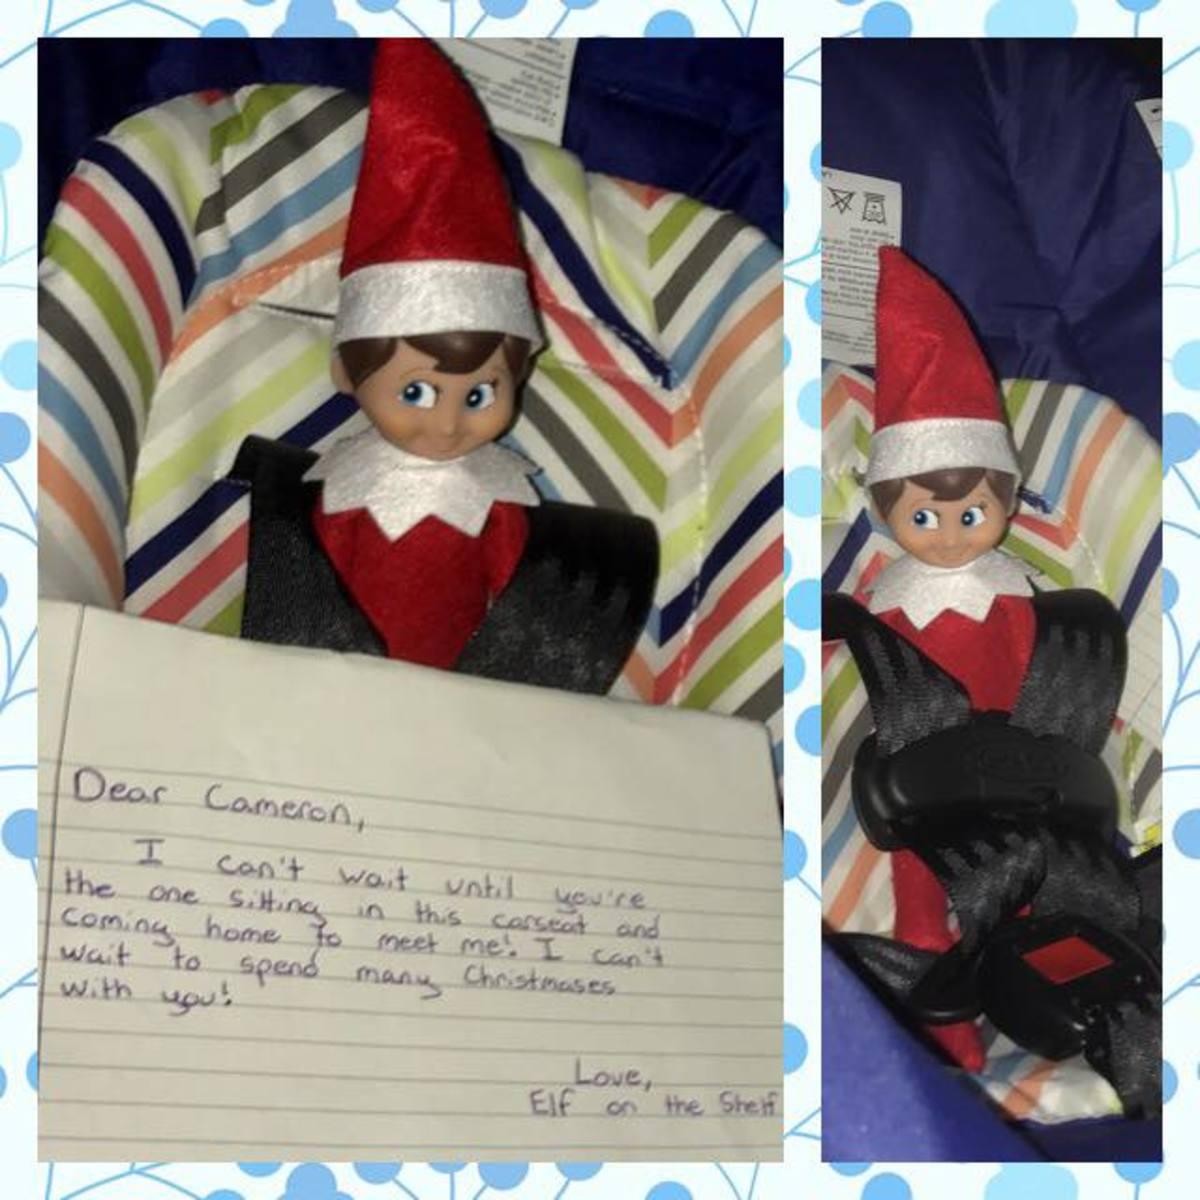 Elf on the Shelf Ideas for Baby